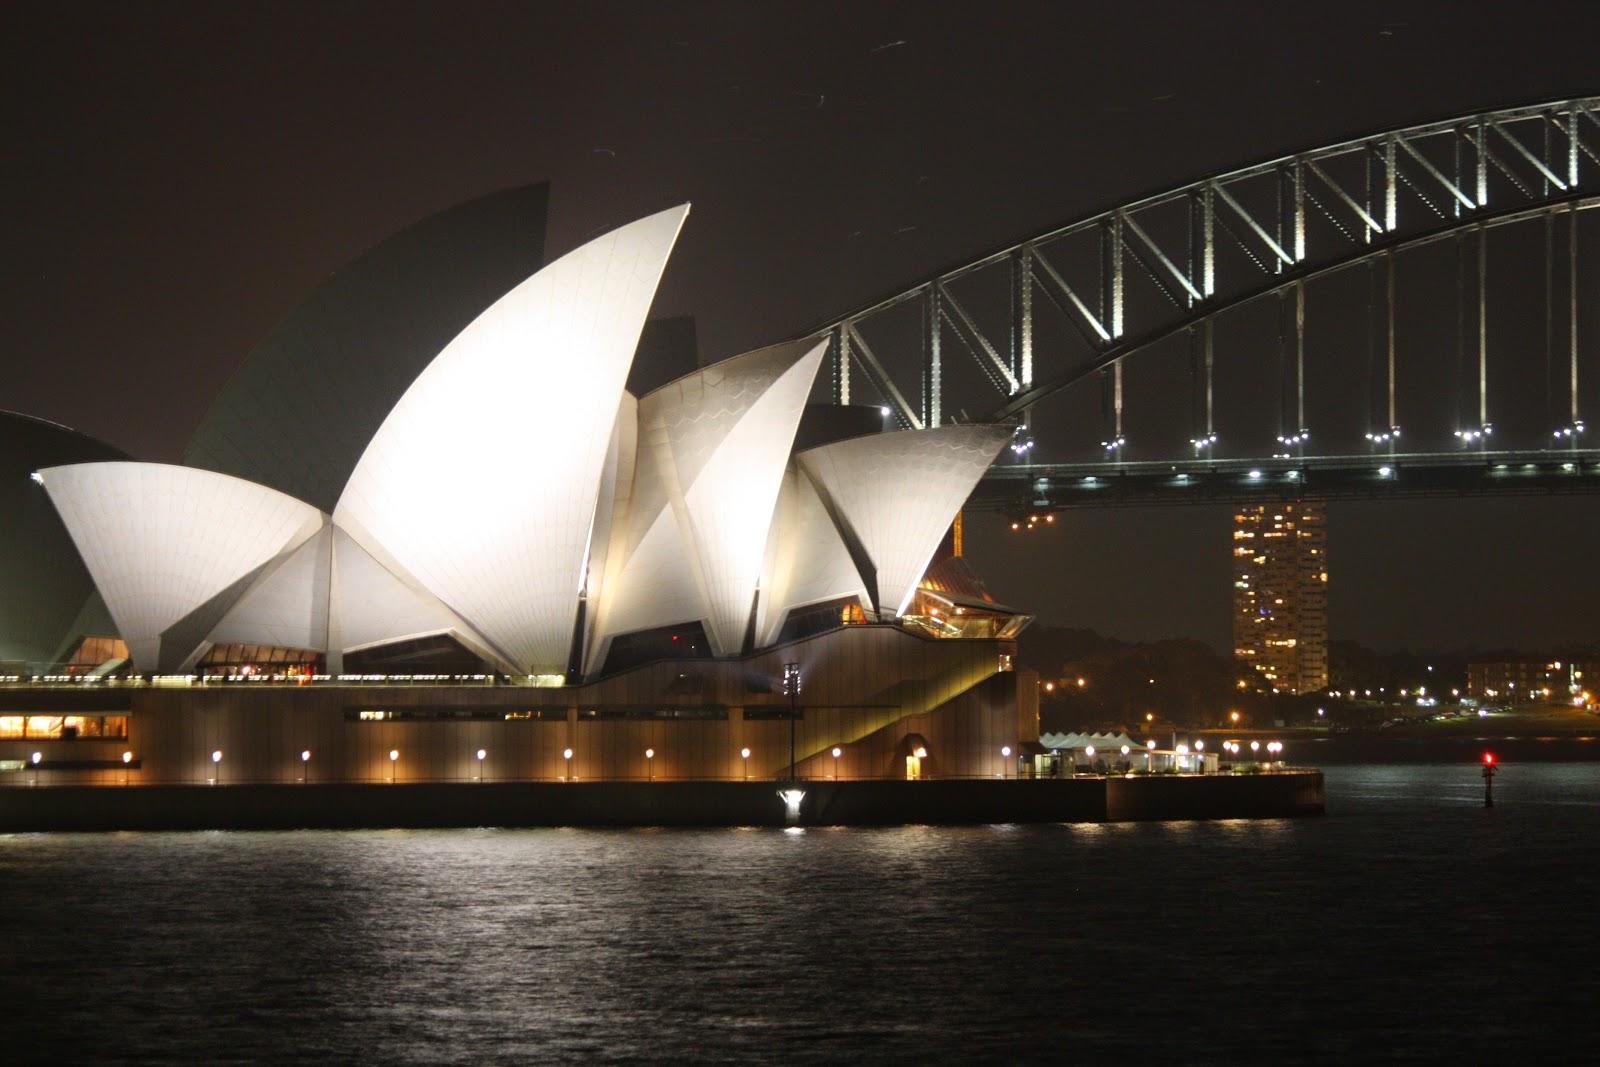 Sydney opera house and harbour bridge - Sydney Opera House And Sydney Harbour Bridge Theme Day Landmark